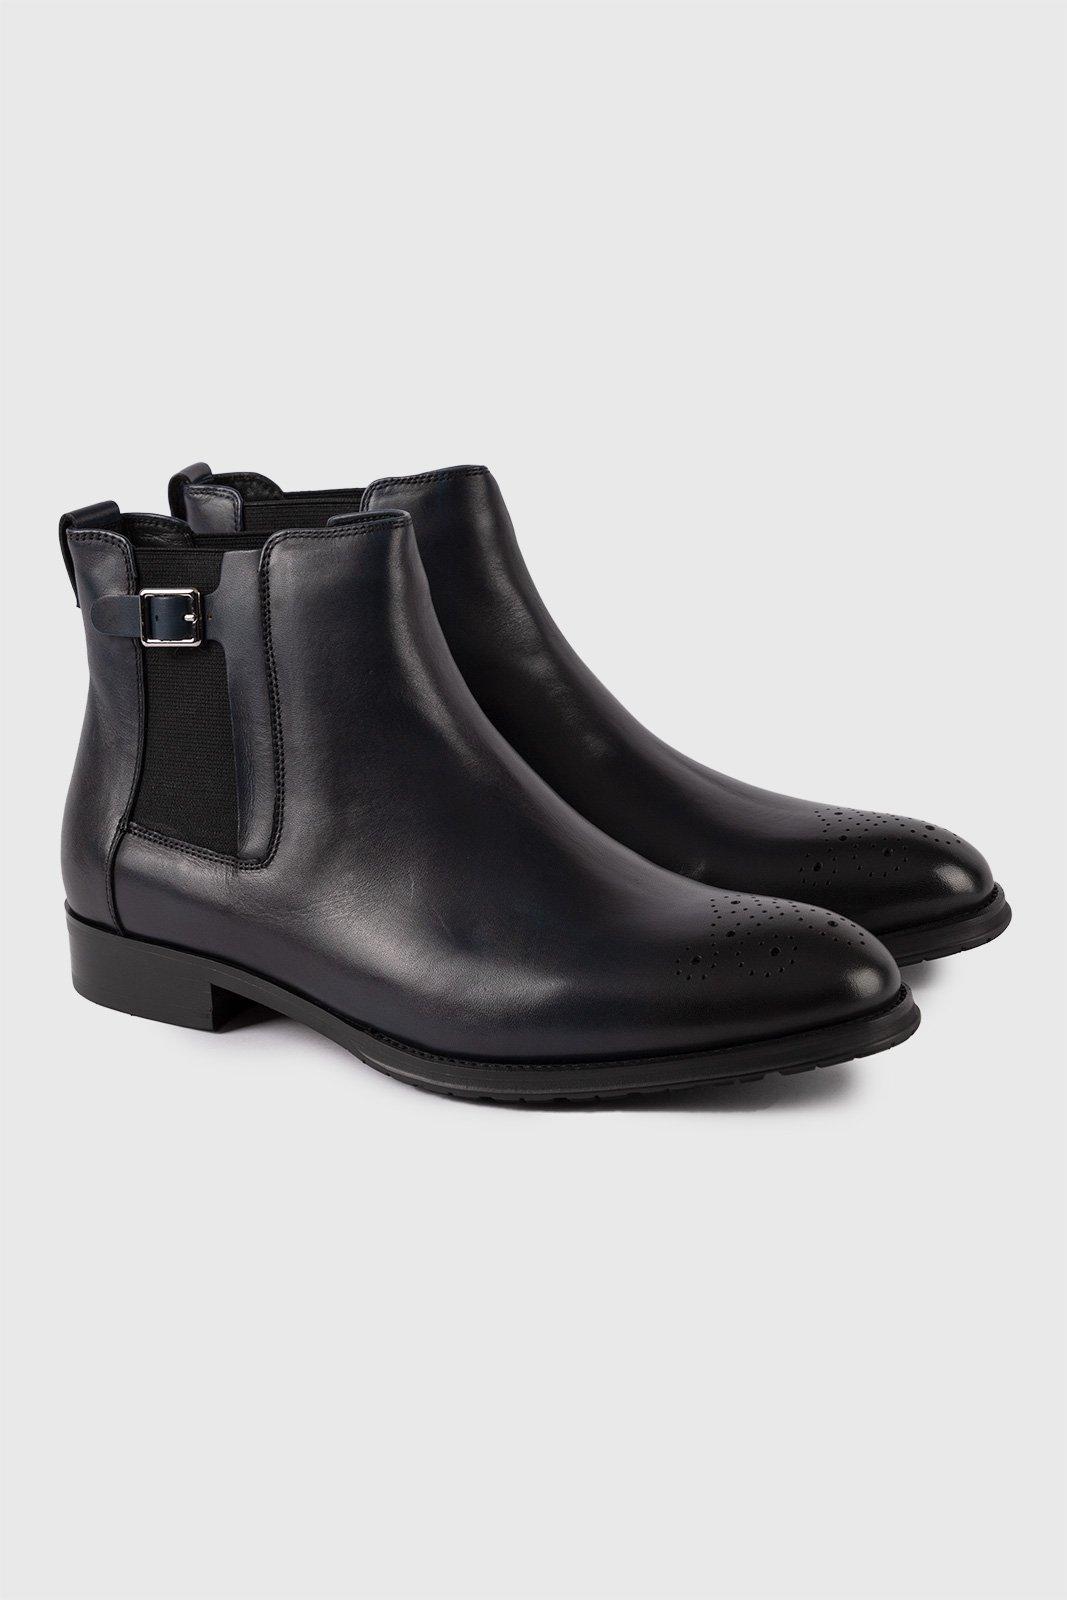 Мужские ботинки челси KANZLER